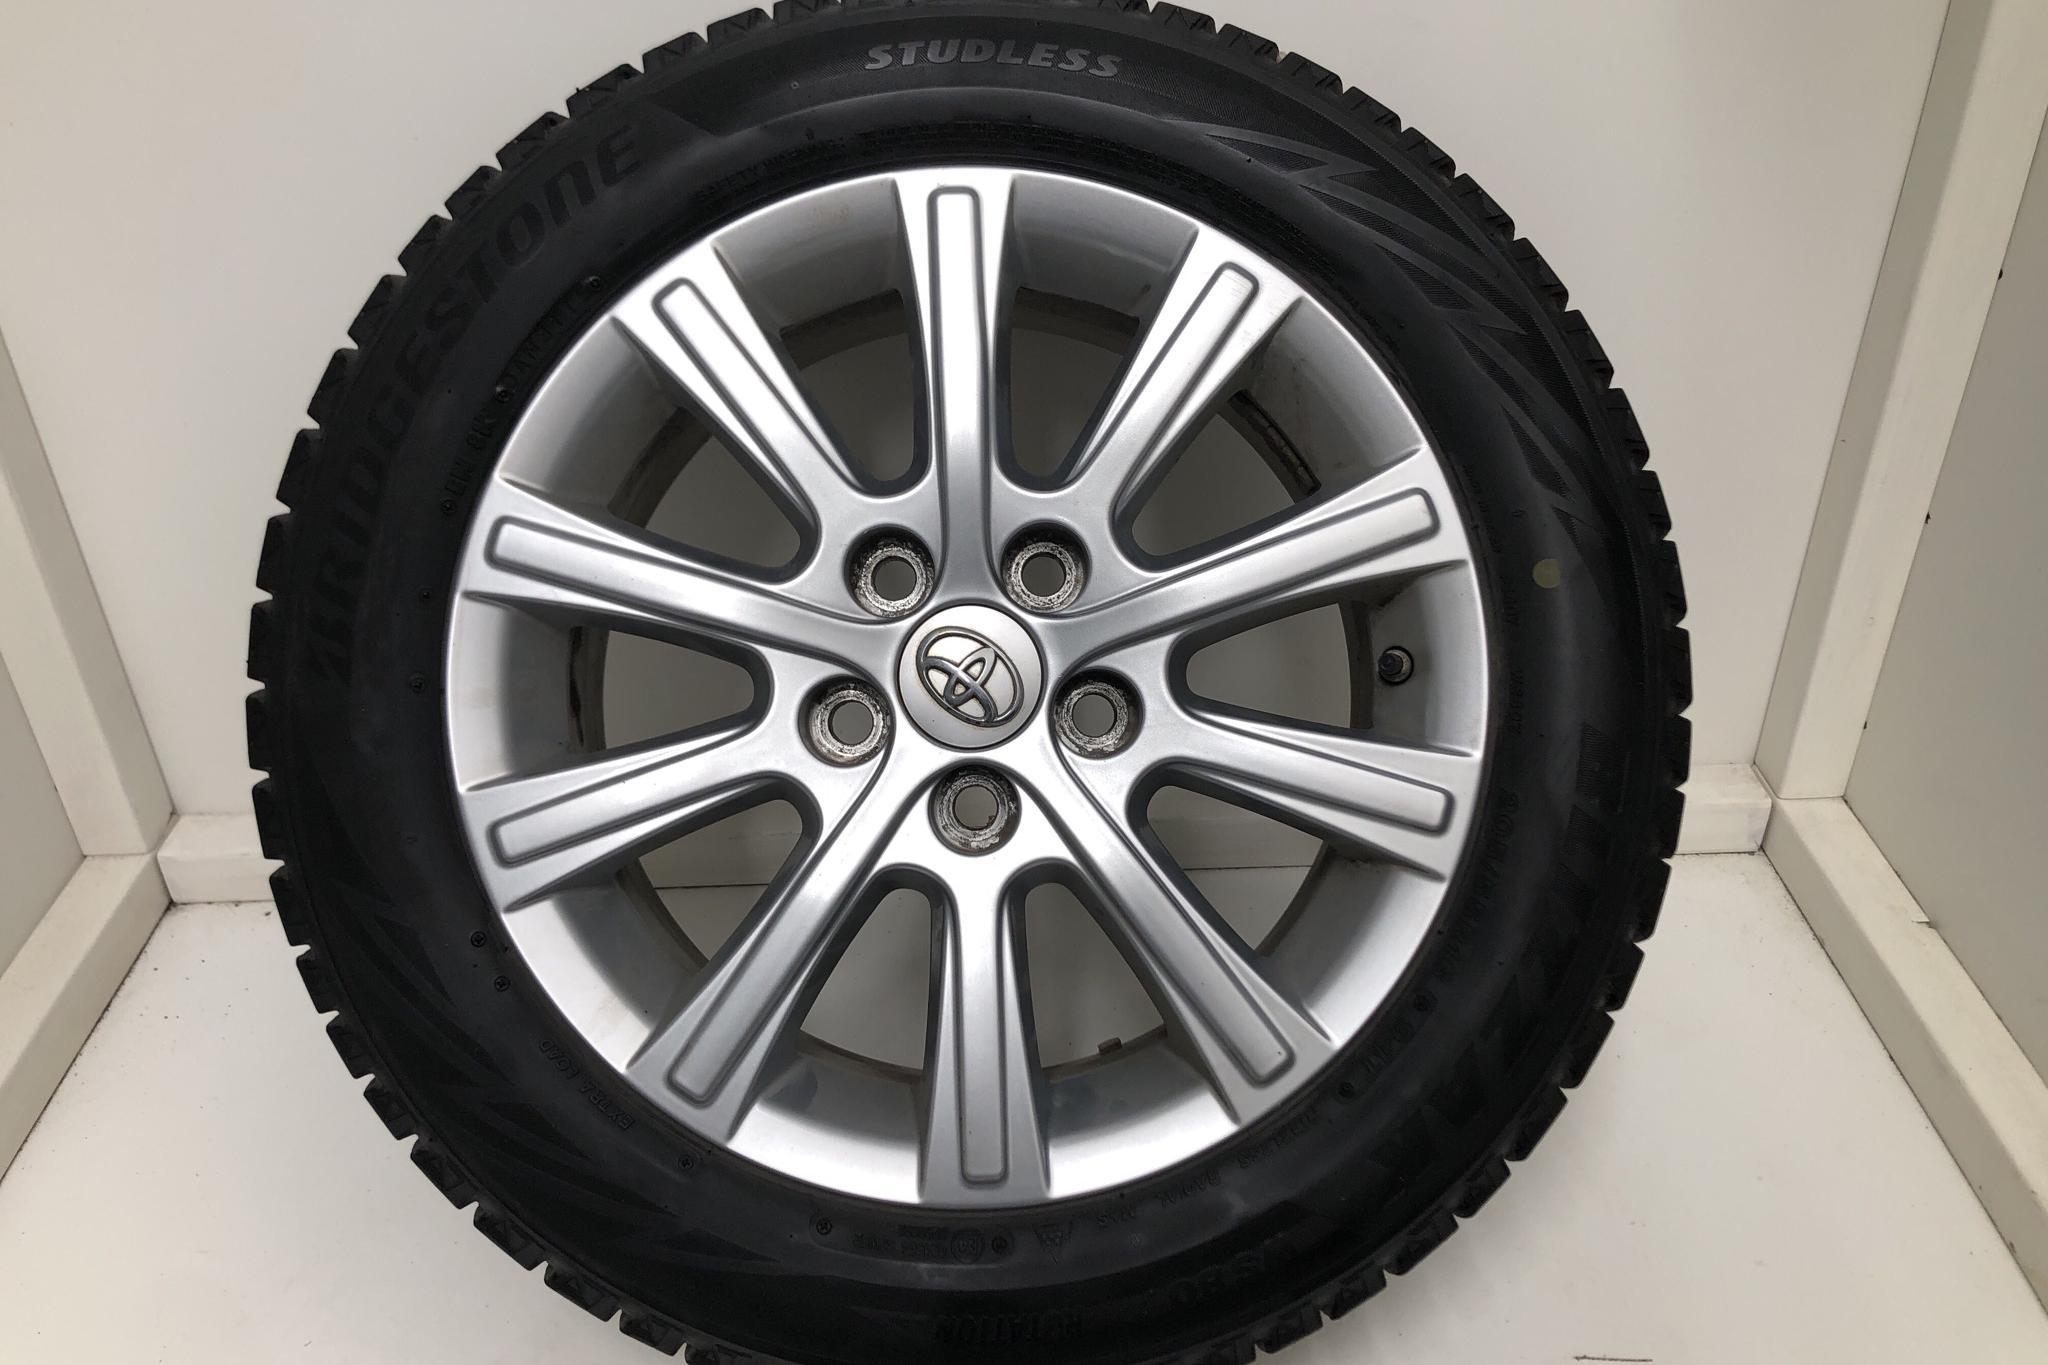 Toyota Auris 1.8 HSD Touring Sports (99hk) - 8 359 mil - Automat - svart - 2016